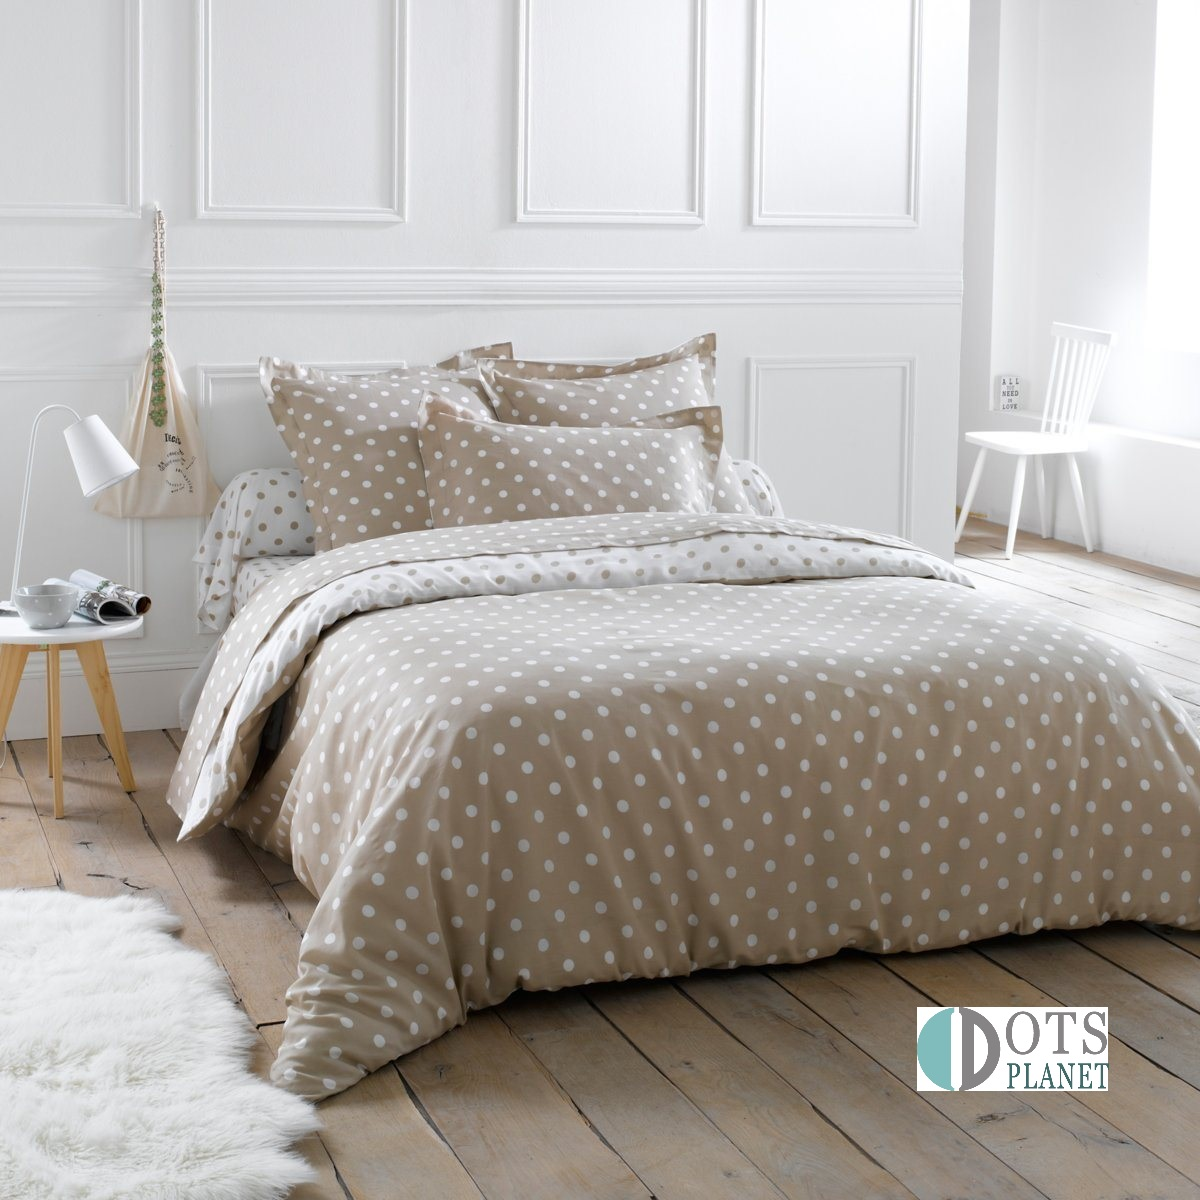 po ciel groszki kropki be 140x200. Black Bedroom Furniture Sets. Home Design Ideas